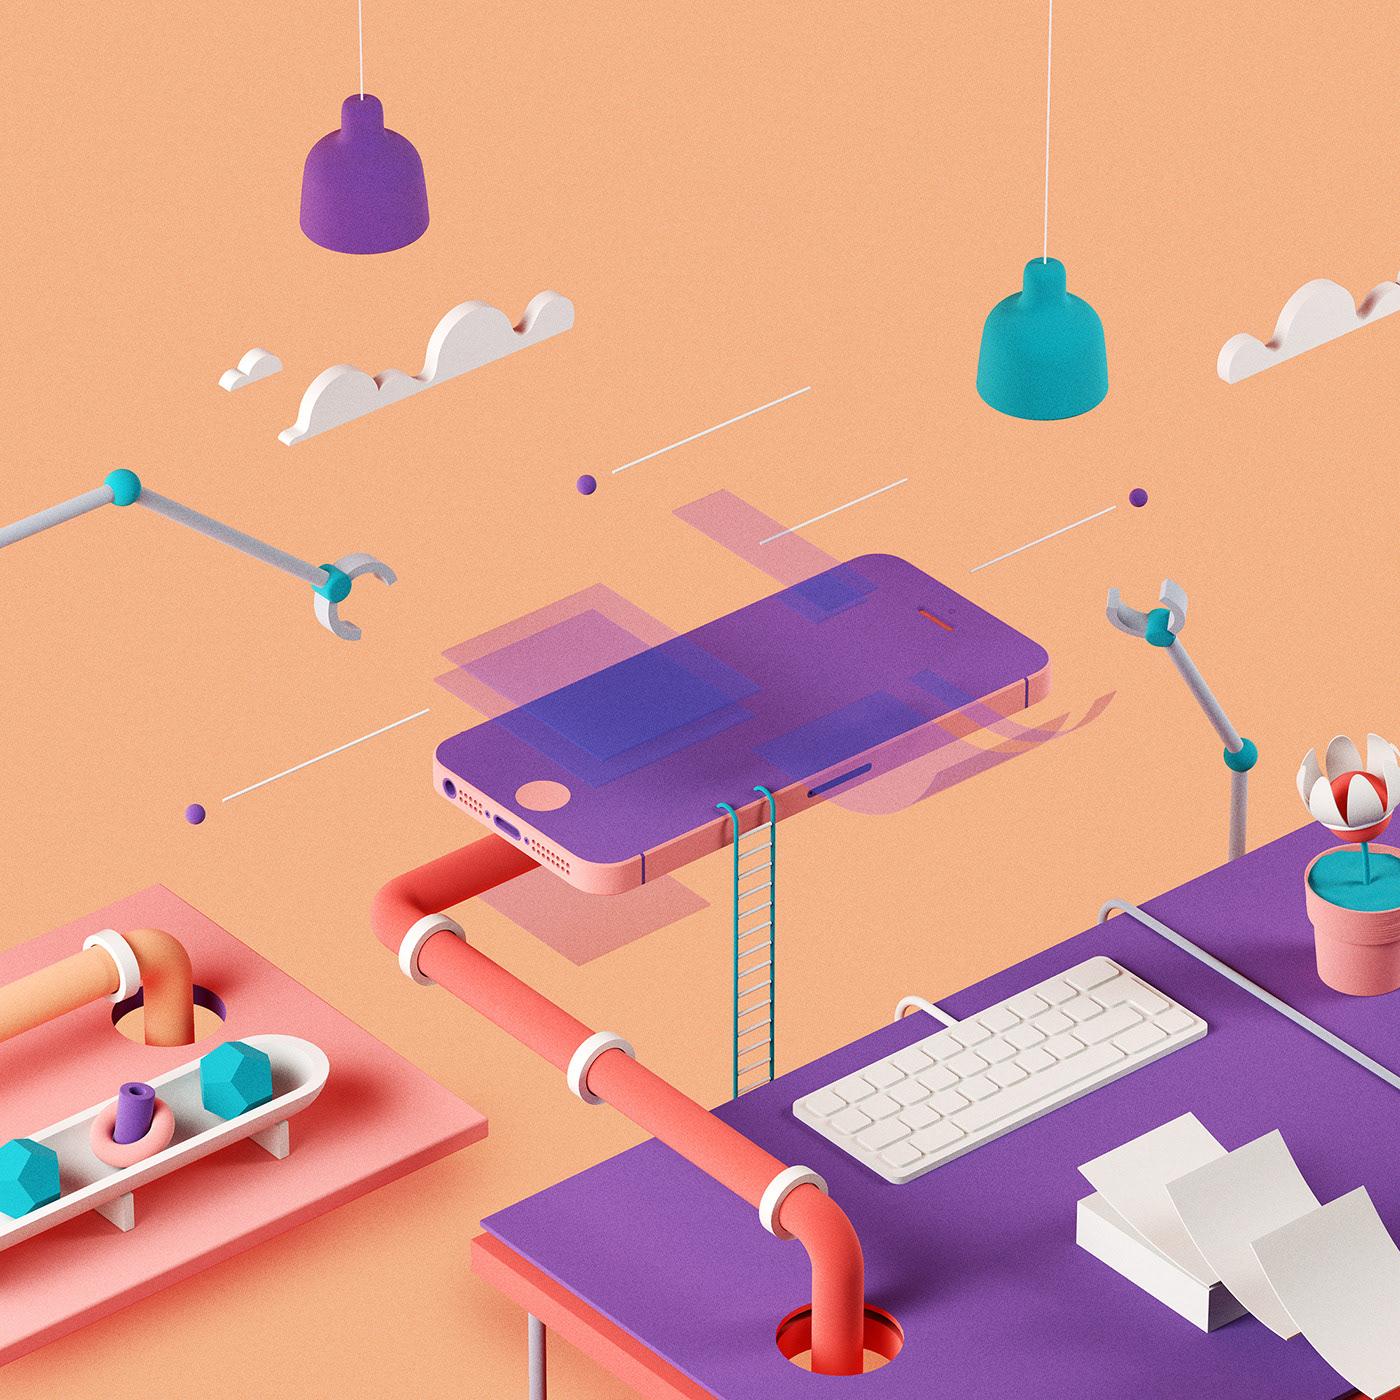 2019 Design Trends Guide on Behance